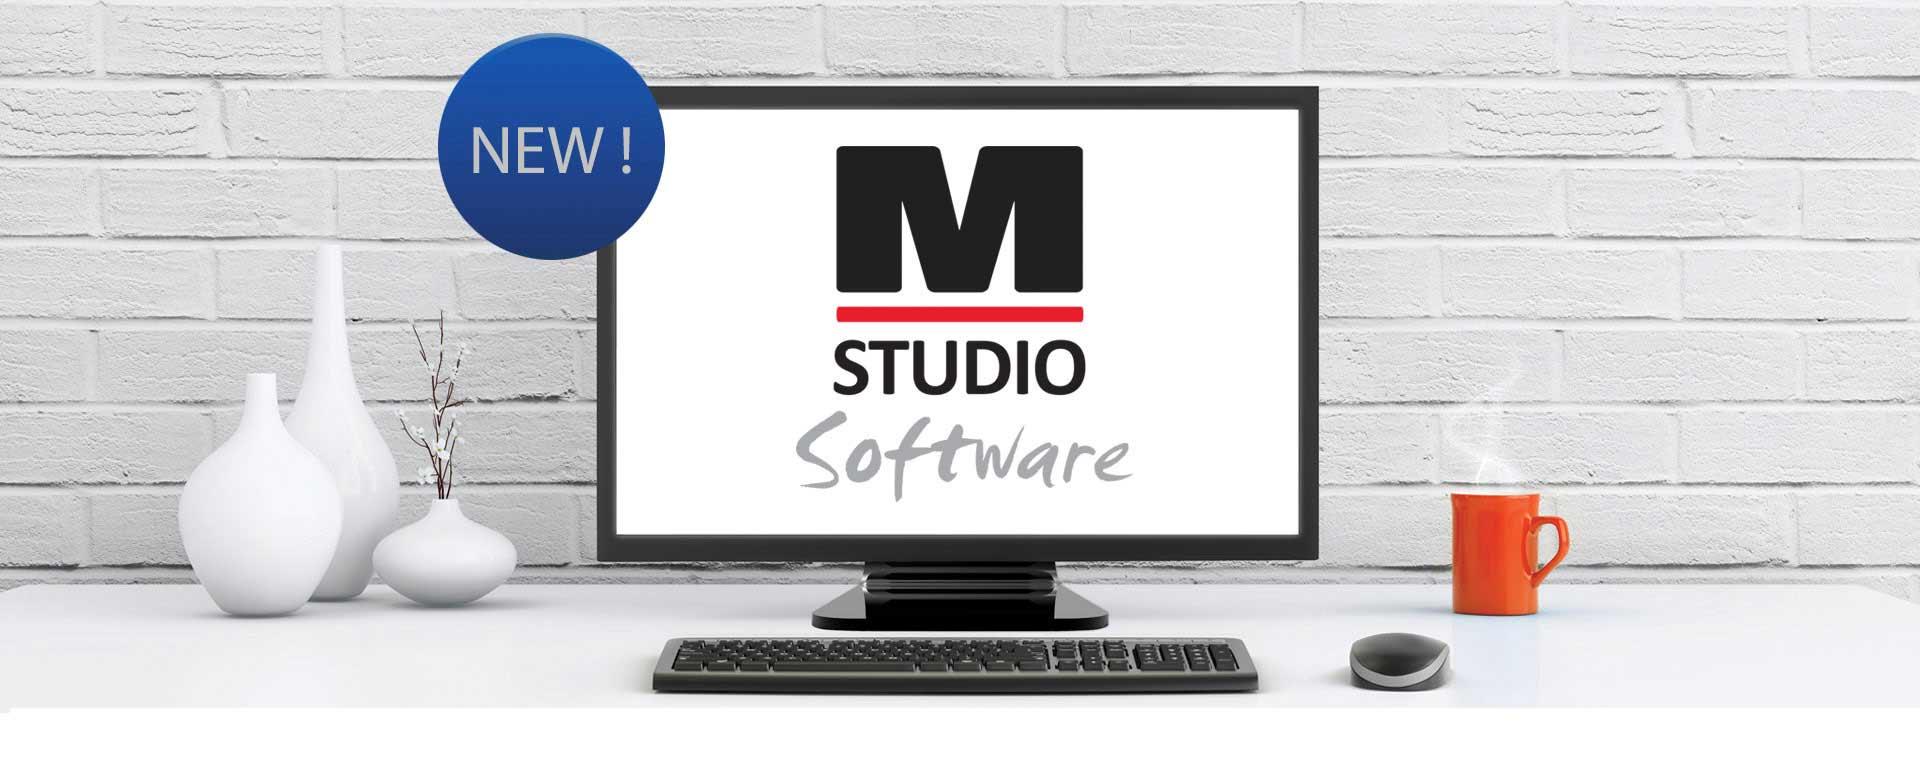 studio-software-logo-on-computer-screen